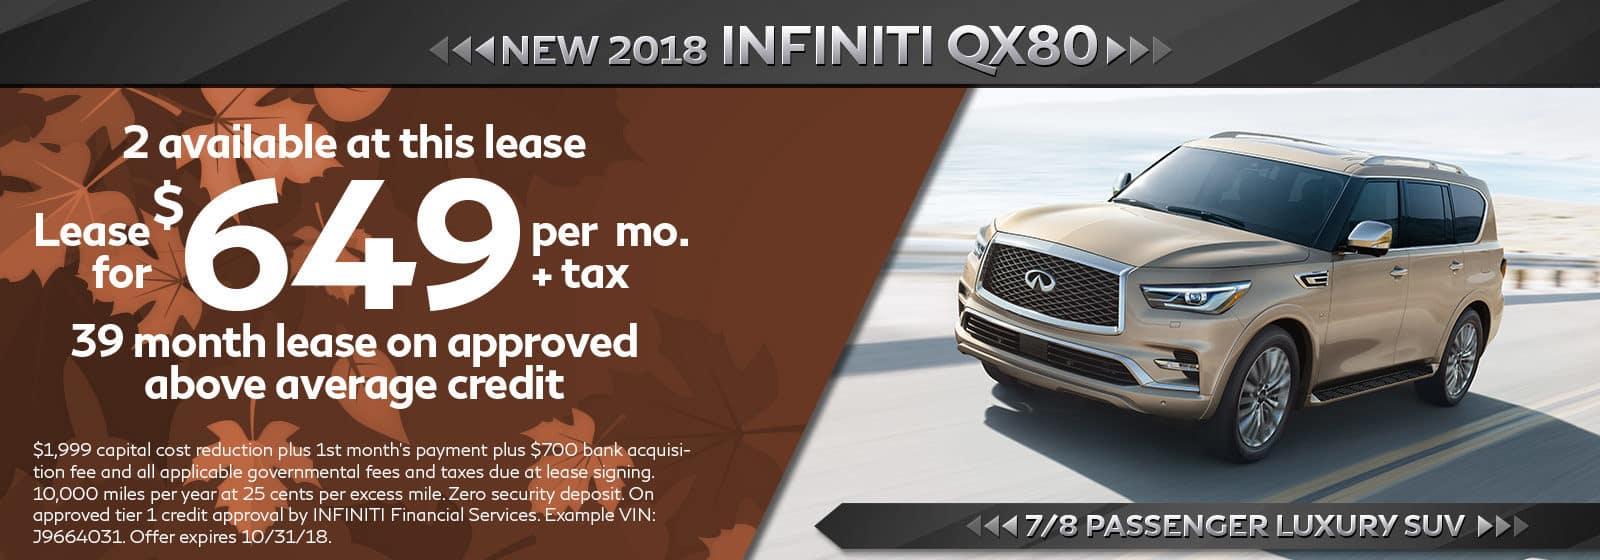 New-2018-Infiniti-QX80